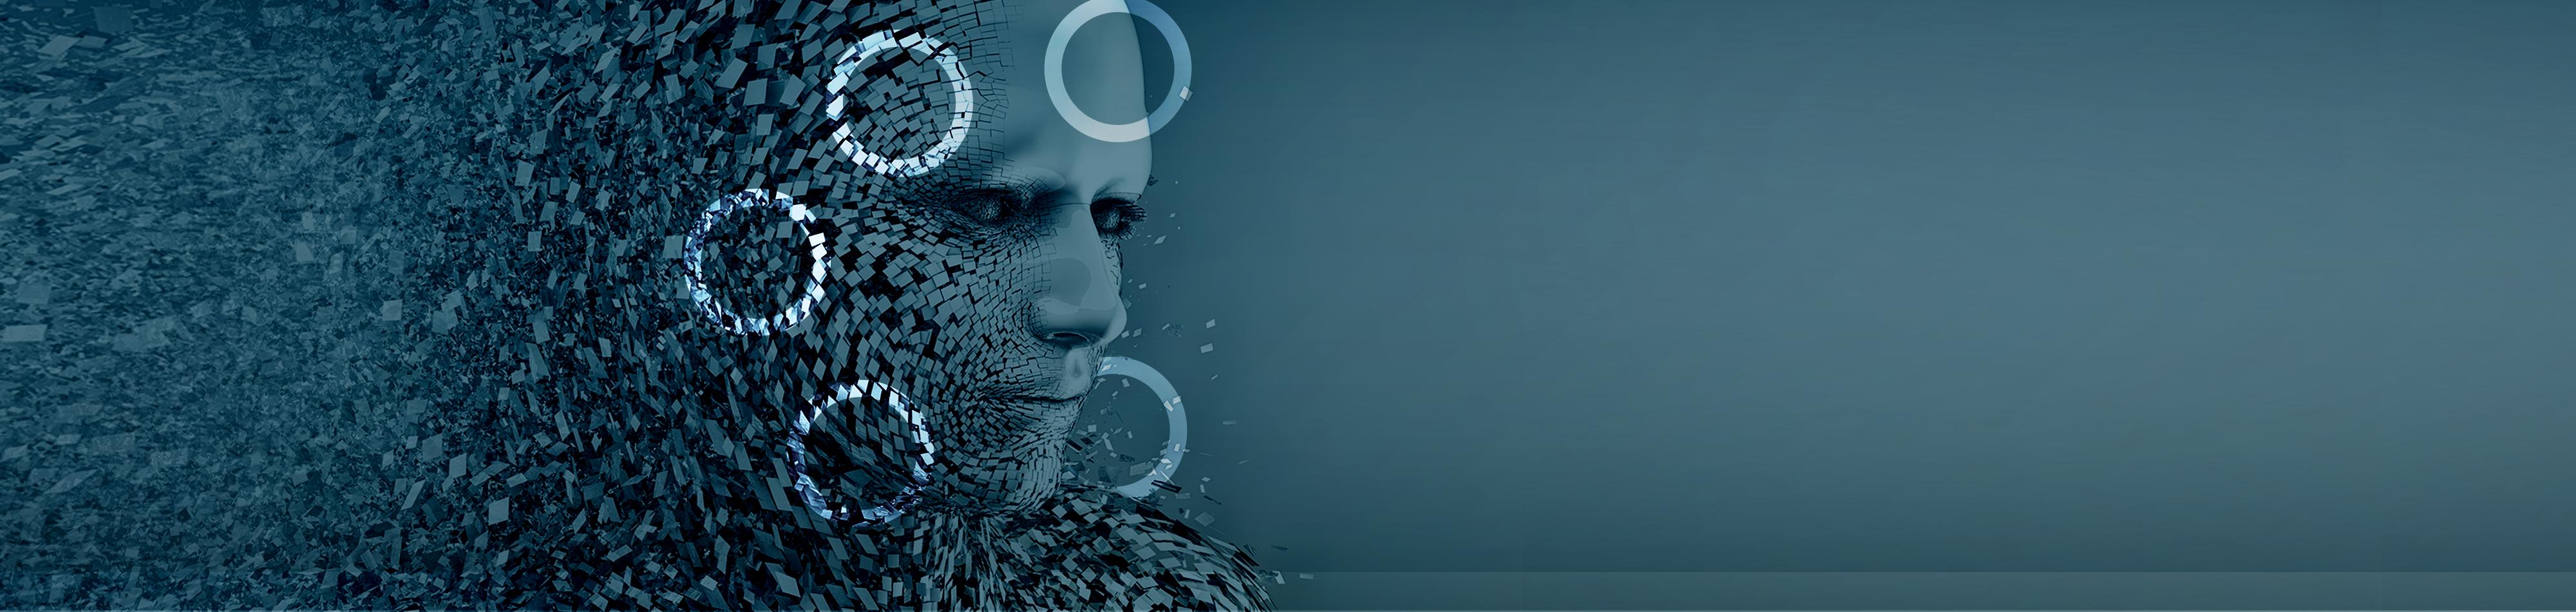 Iris AI, dramatically changing the economics of cloud, analytics, and digital transformation